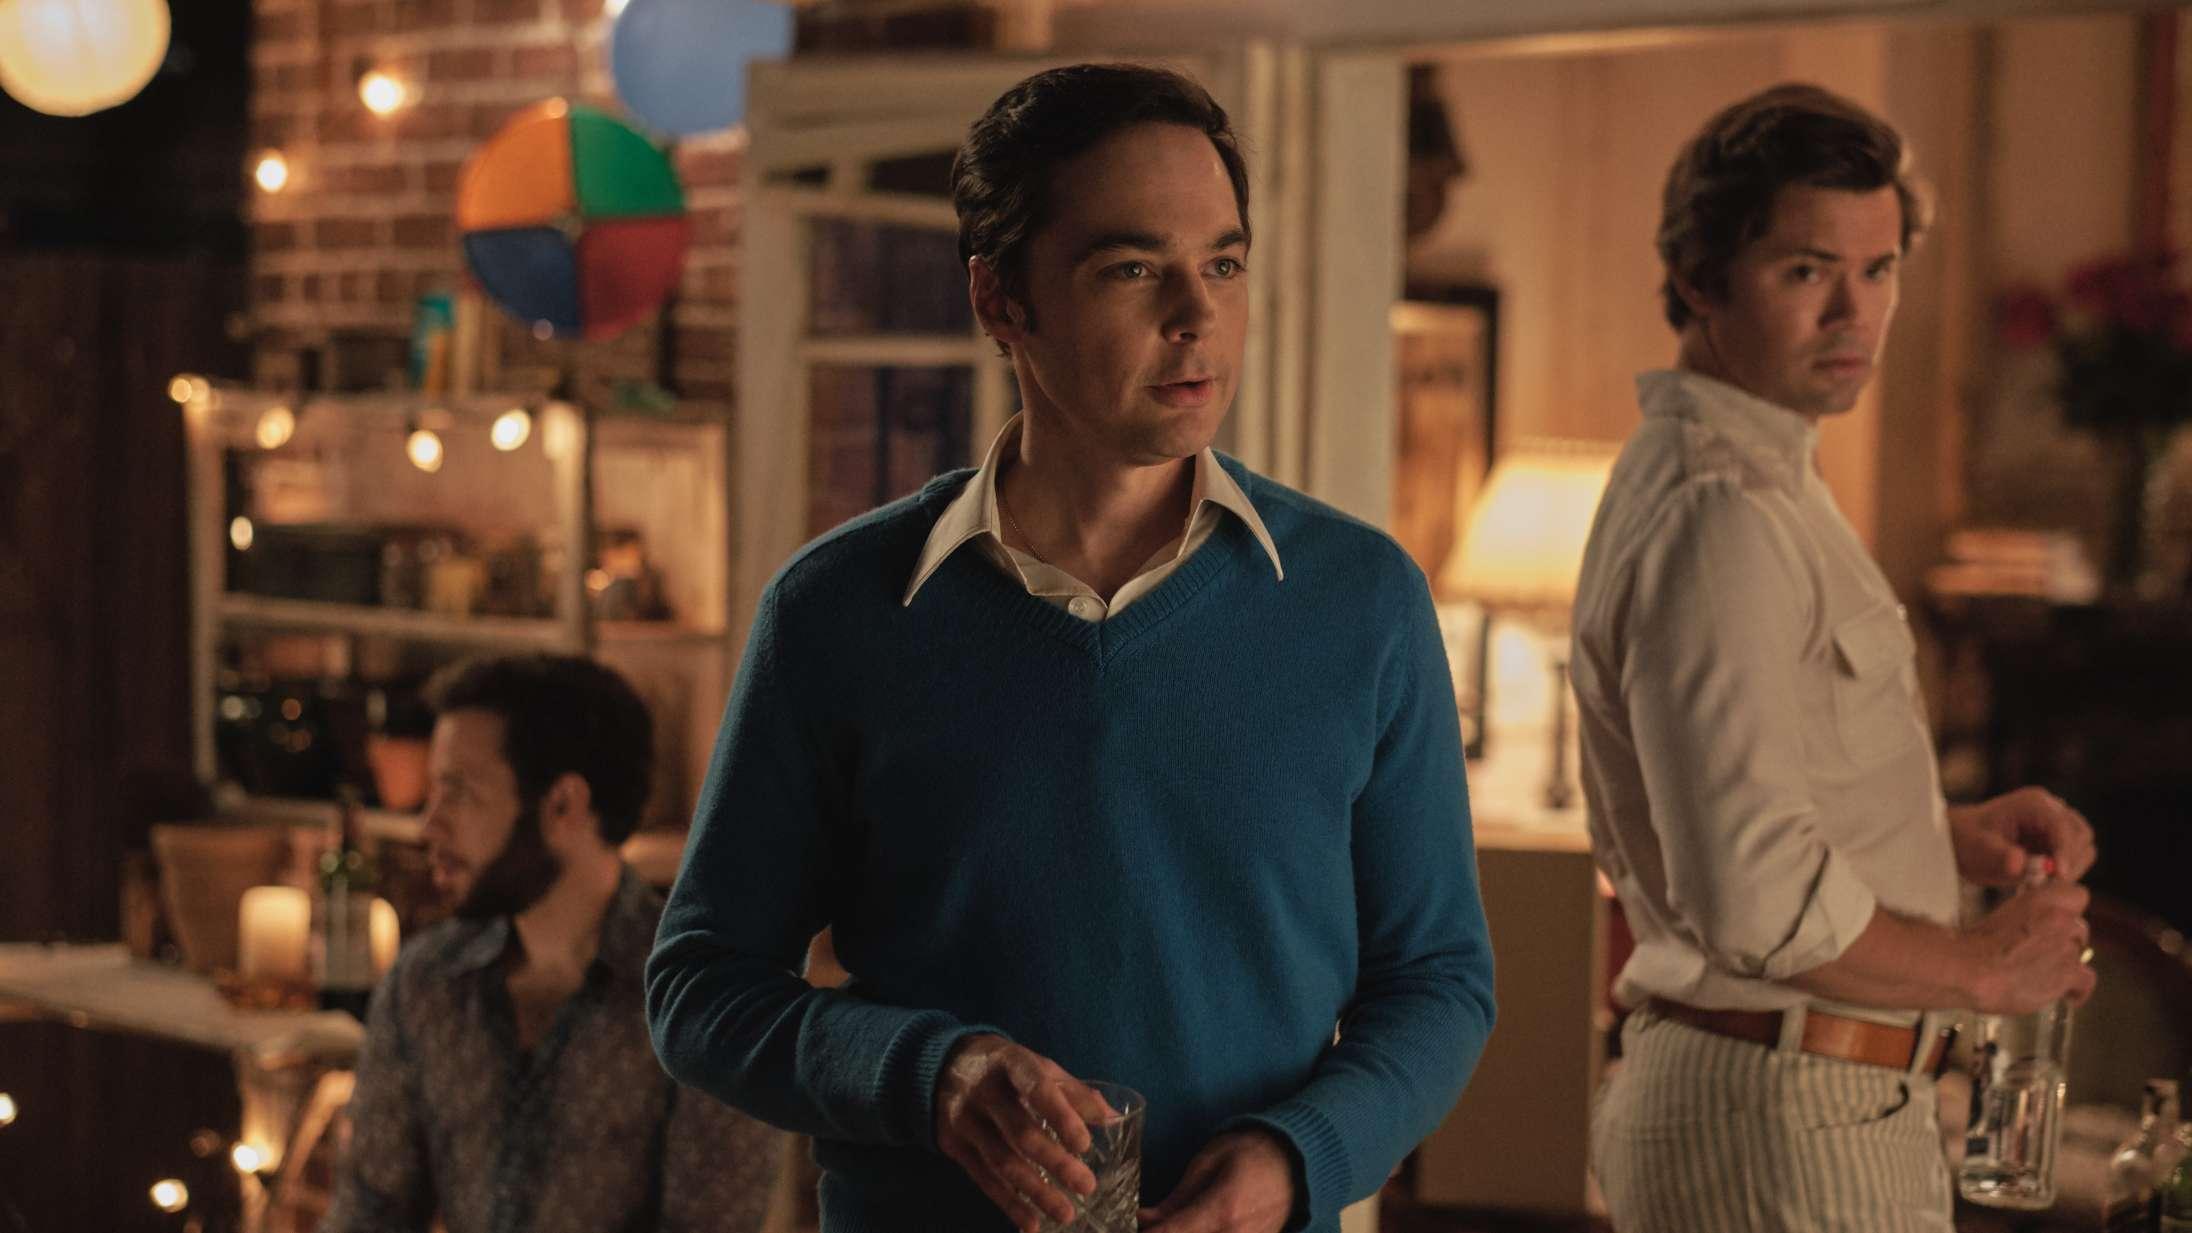 'The Boys in the Band': Stjernebesat Netflix-film om homoer i New York er sjov, rørende og stadig relevant